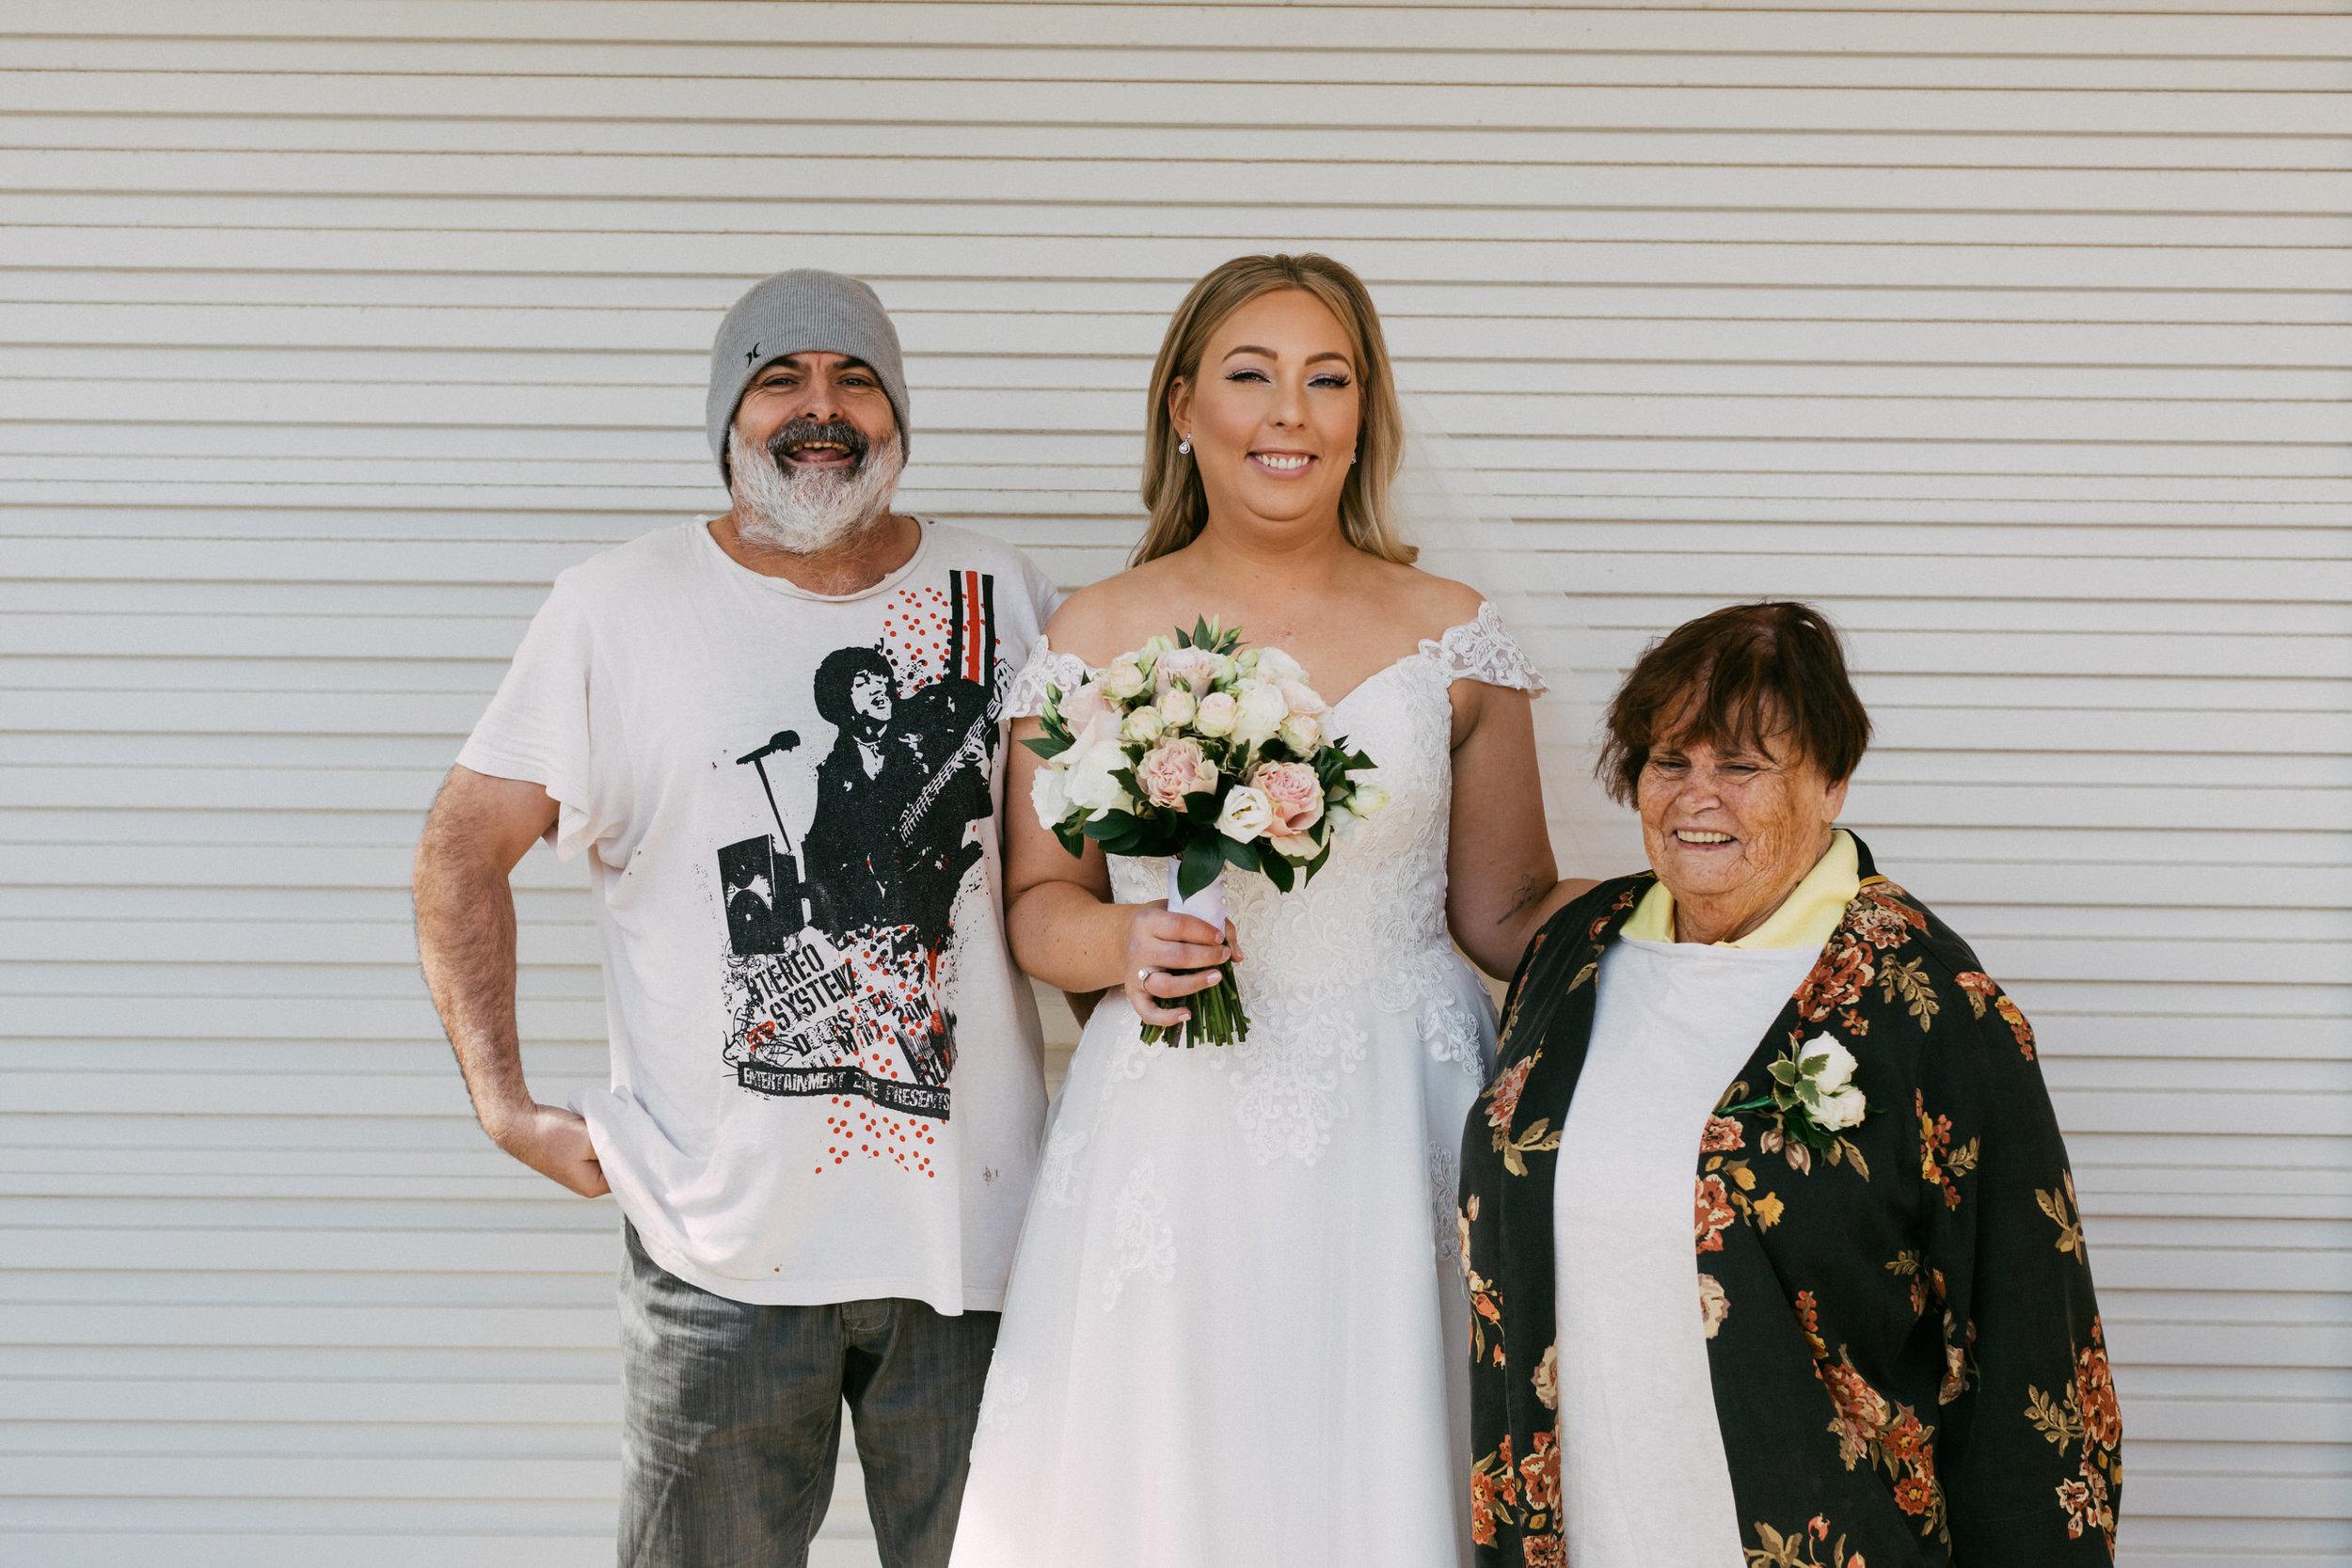 Adelaide Wedding Church Smoke Bomb Serafino 032.jpg